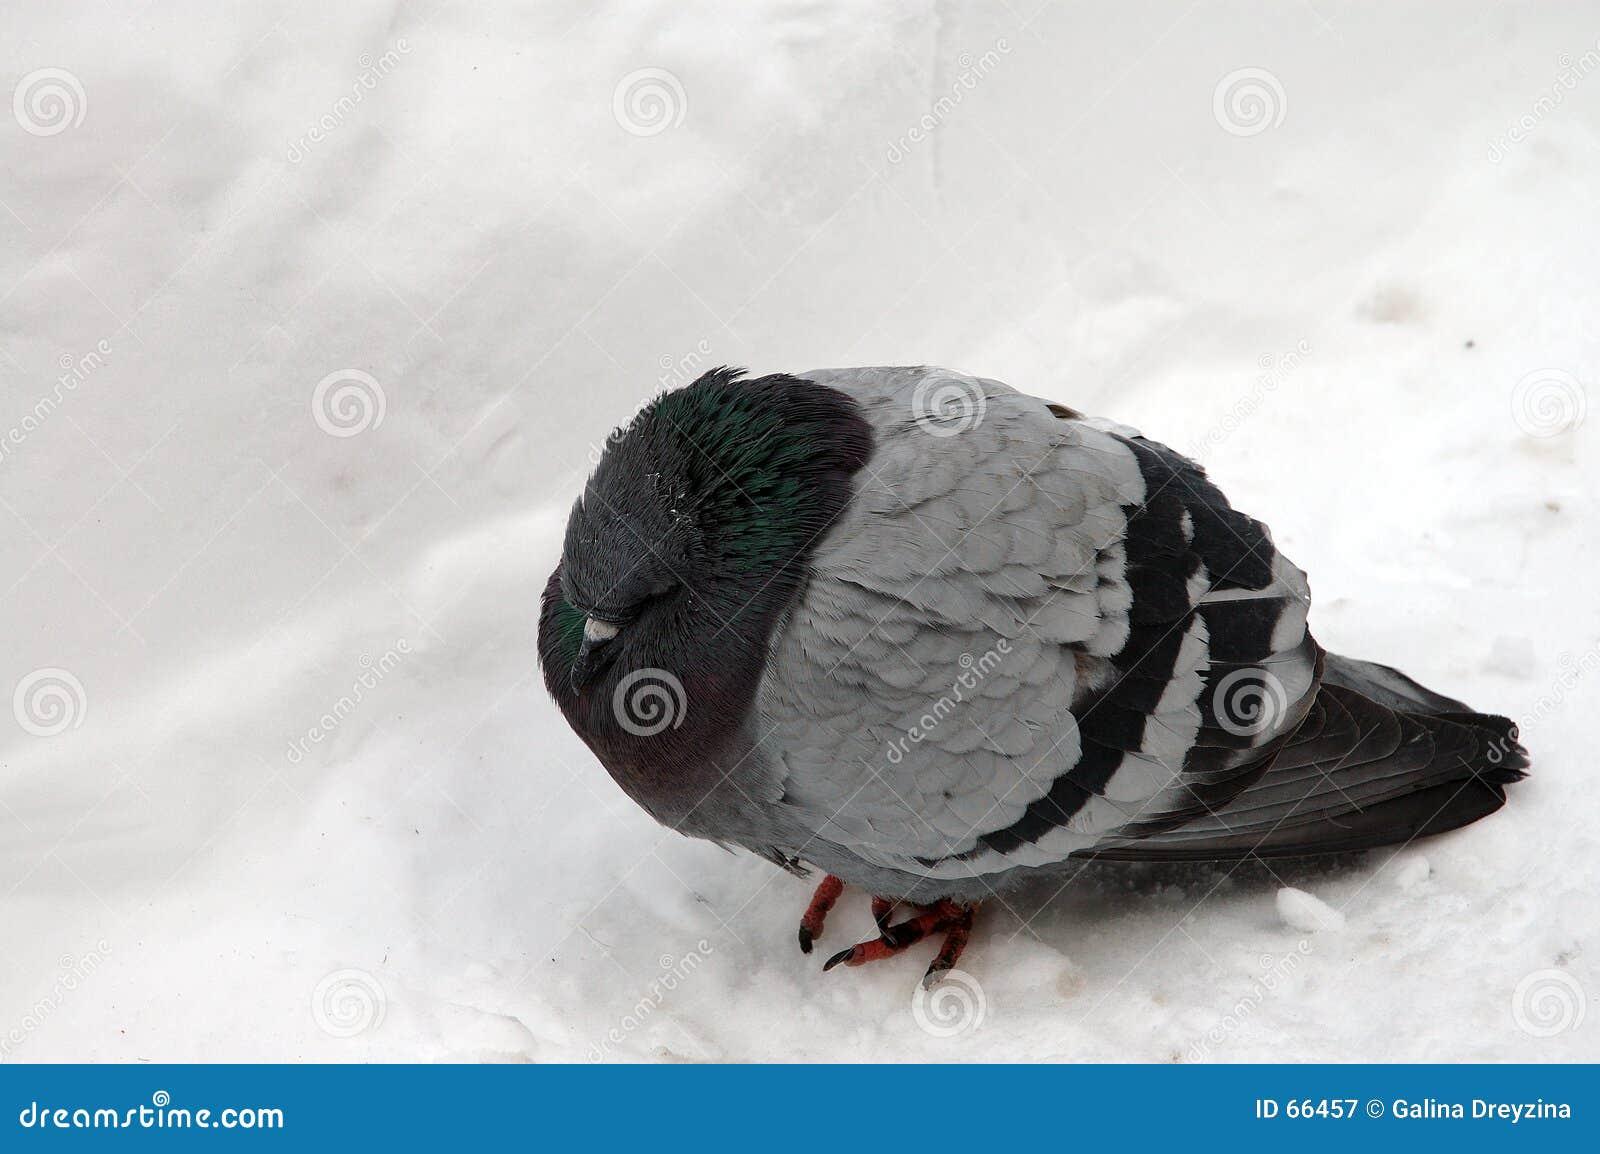 Freezing pigeon